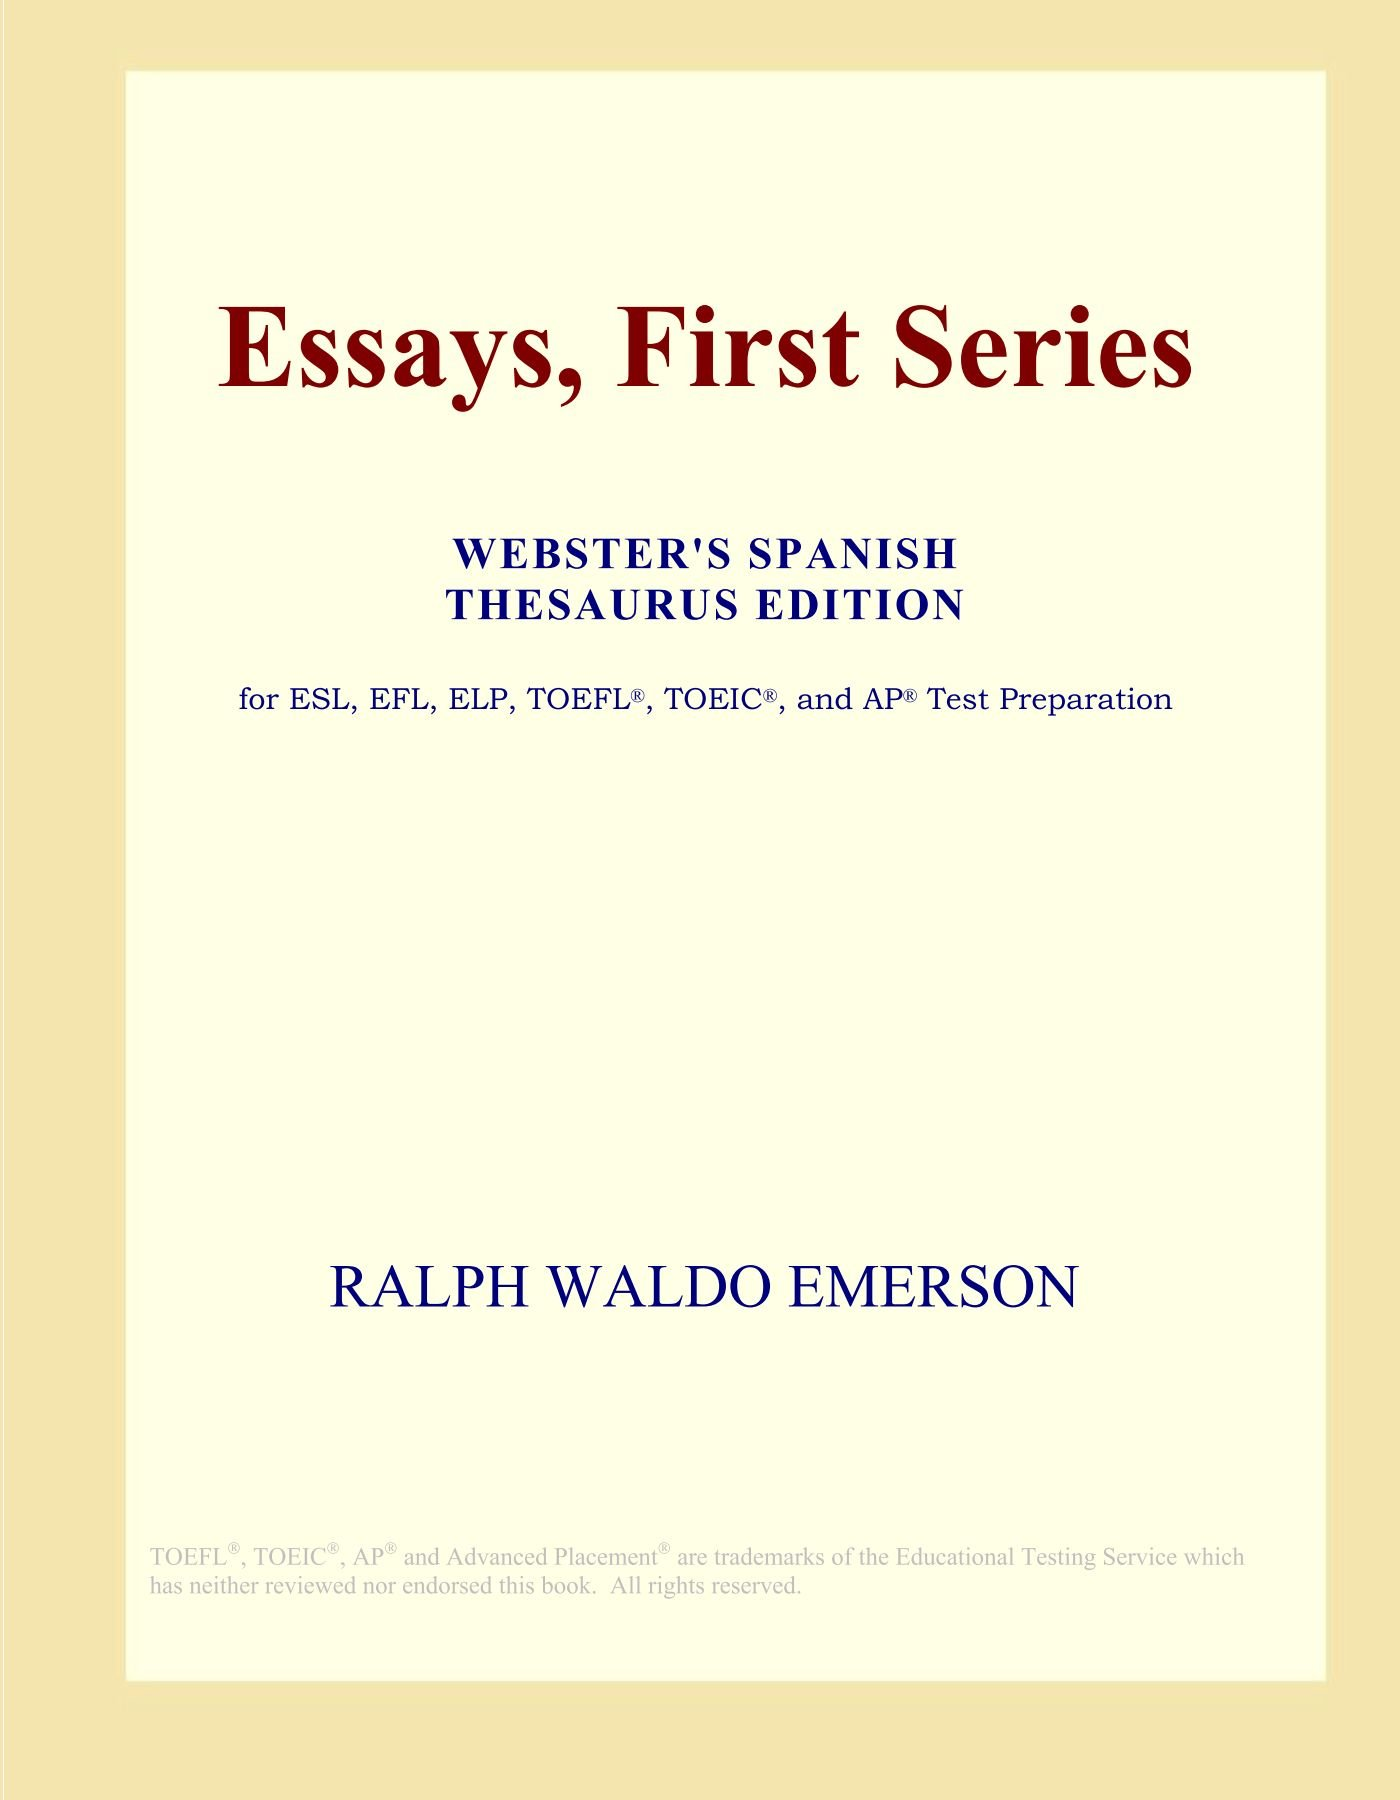 024 Essay Example 61cjxhnthzl Essays First Stunning Series In Zen Buddhism Emerson's Value Full